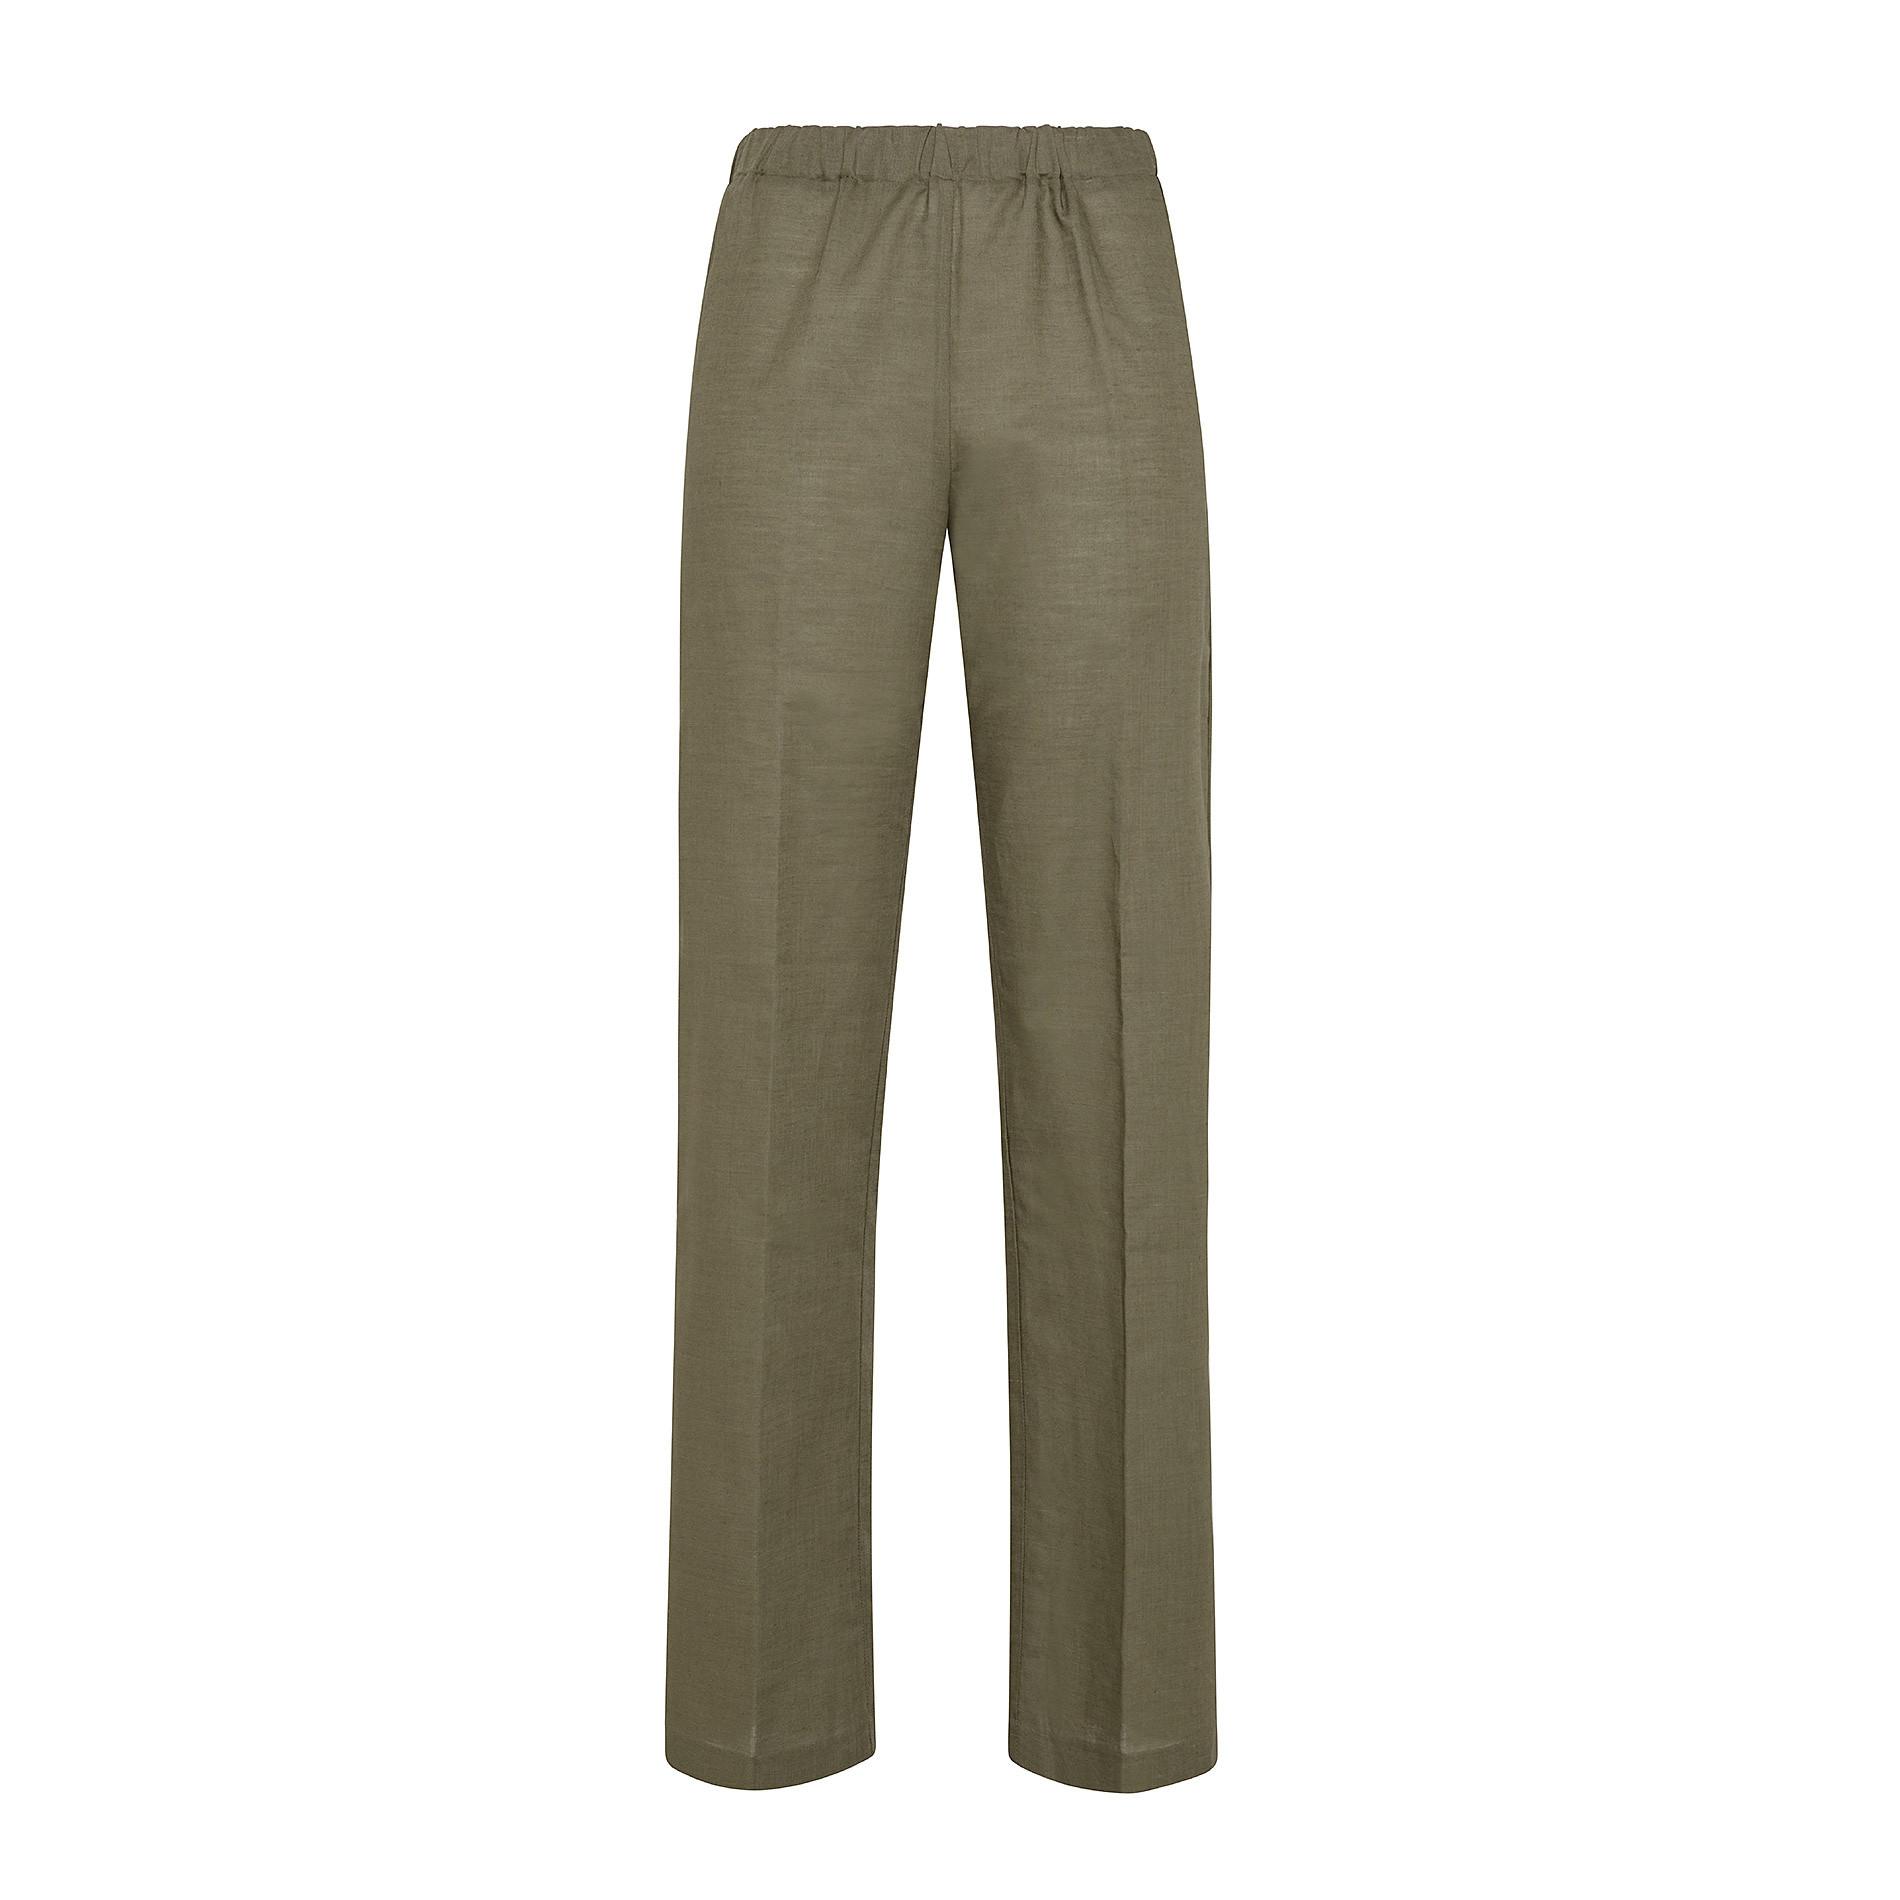 Pantalone misto lino con elastico Koan, Verde scuro, large image number 0